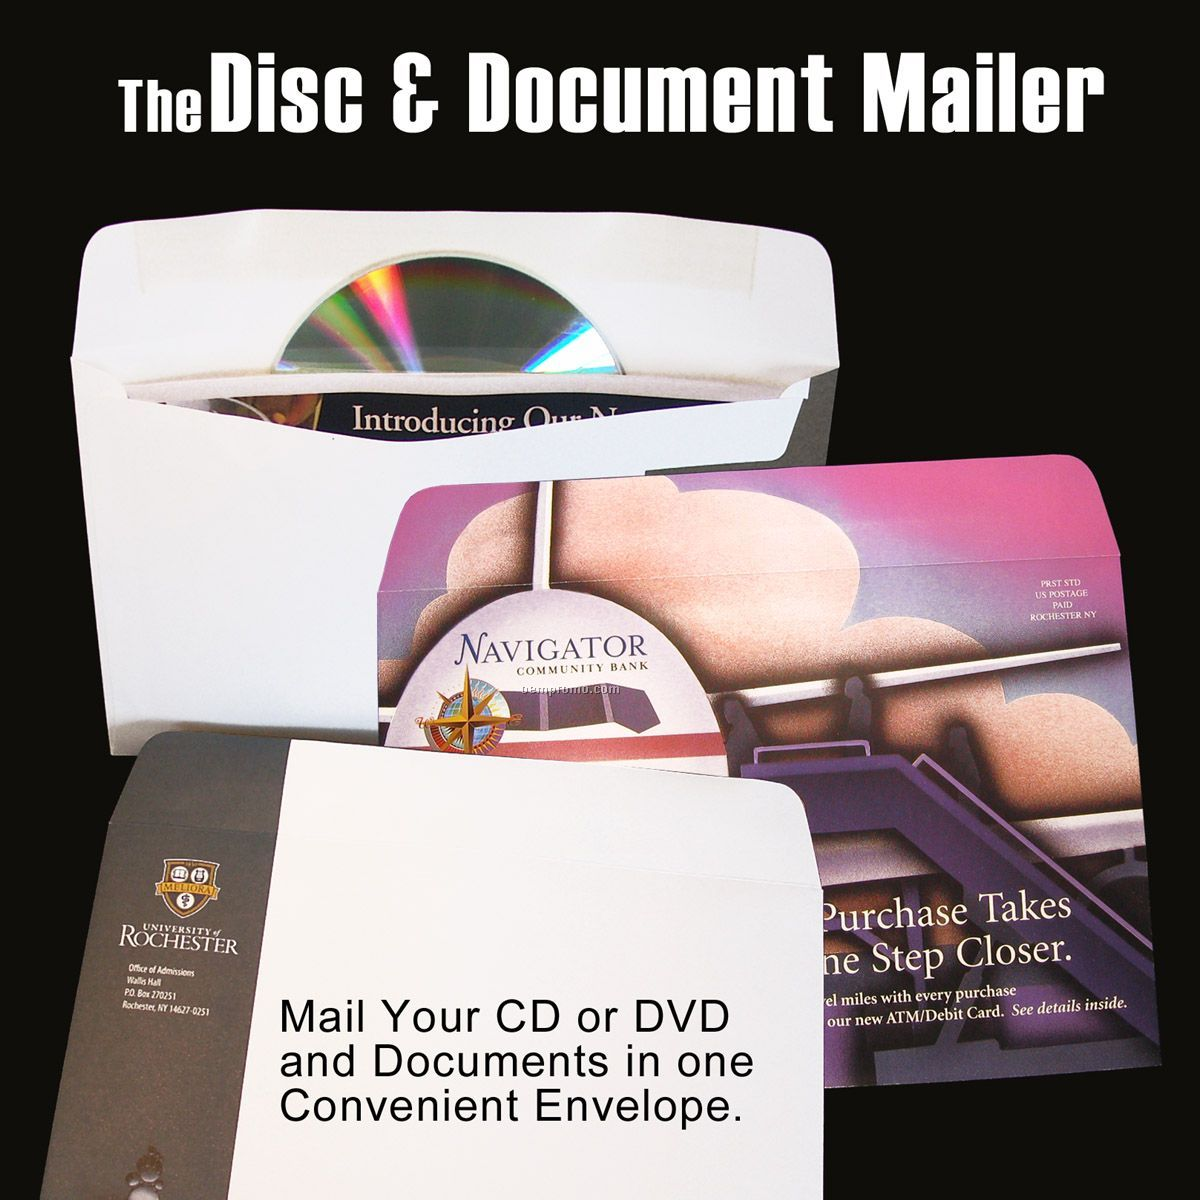 Disc & Document Mailer - 2 Color Disc & Document Mailer